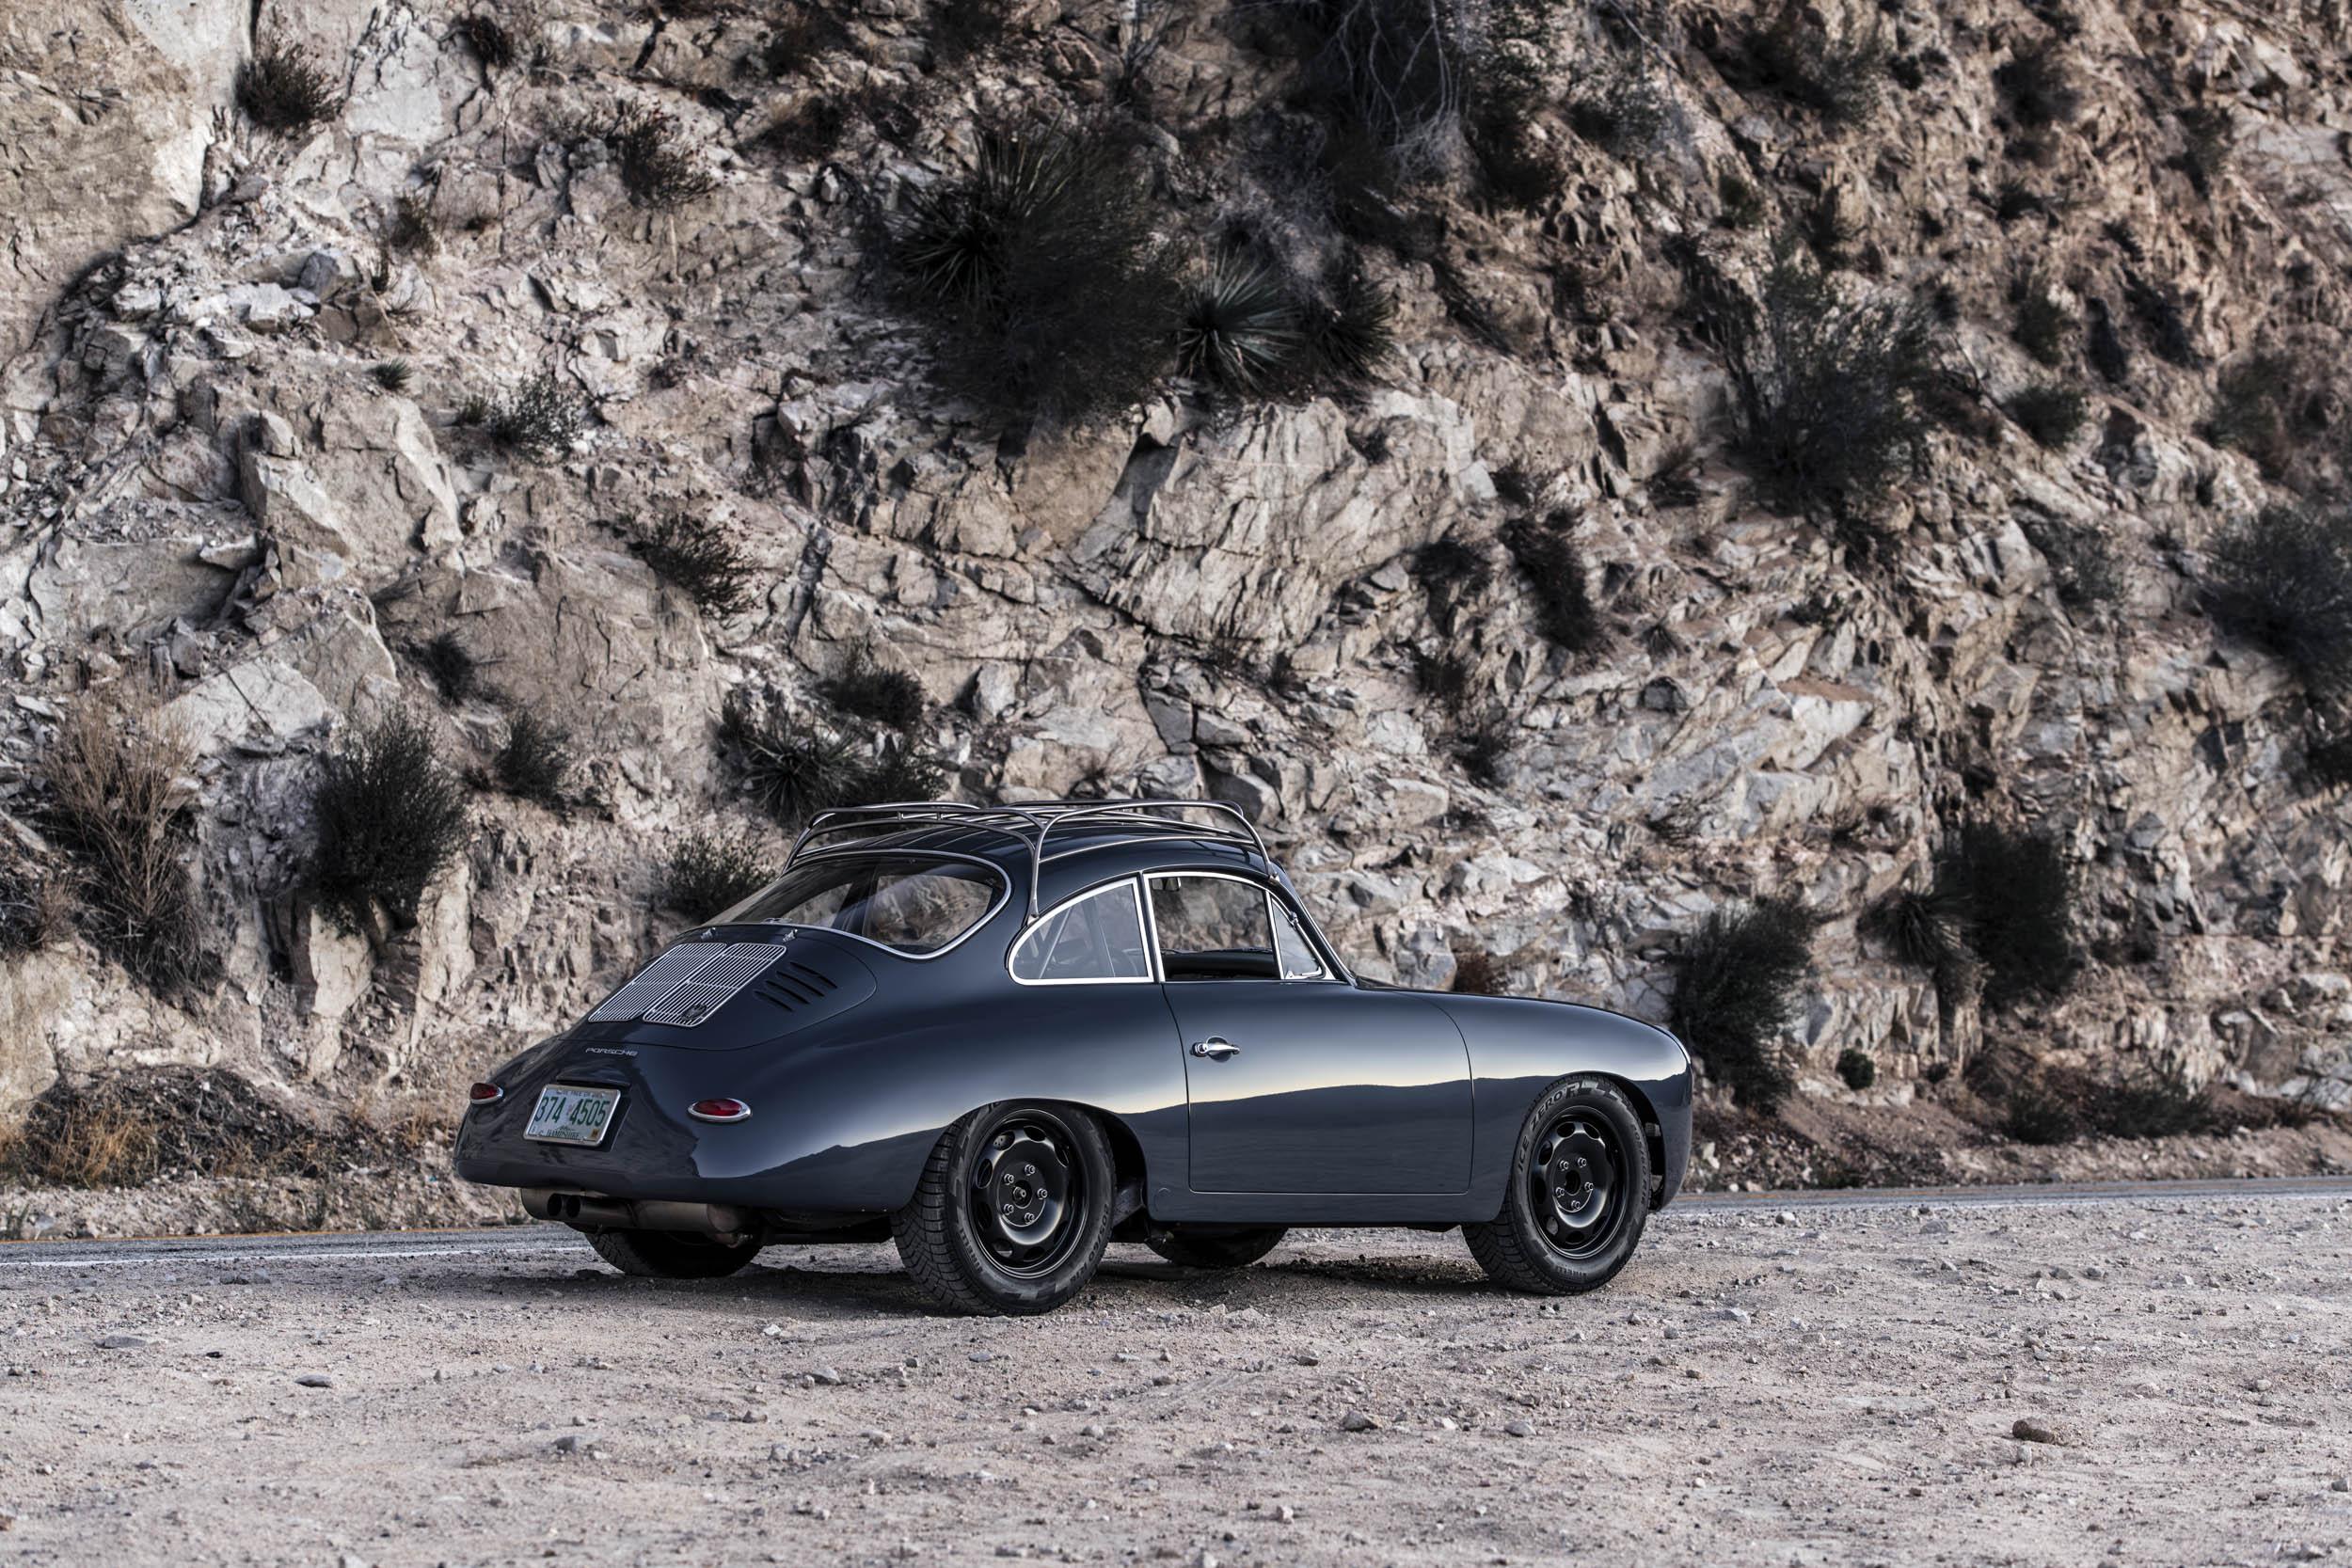 Emory Porsche 356 C4S Allrad